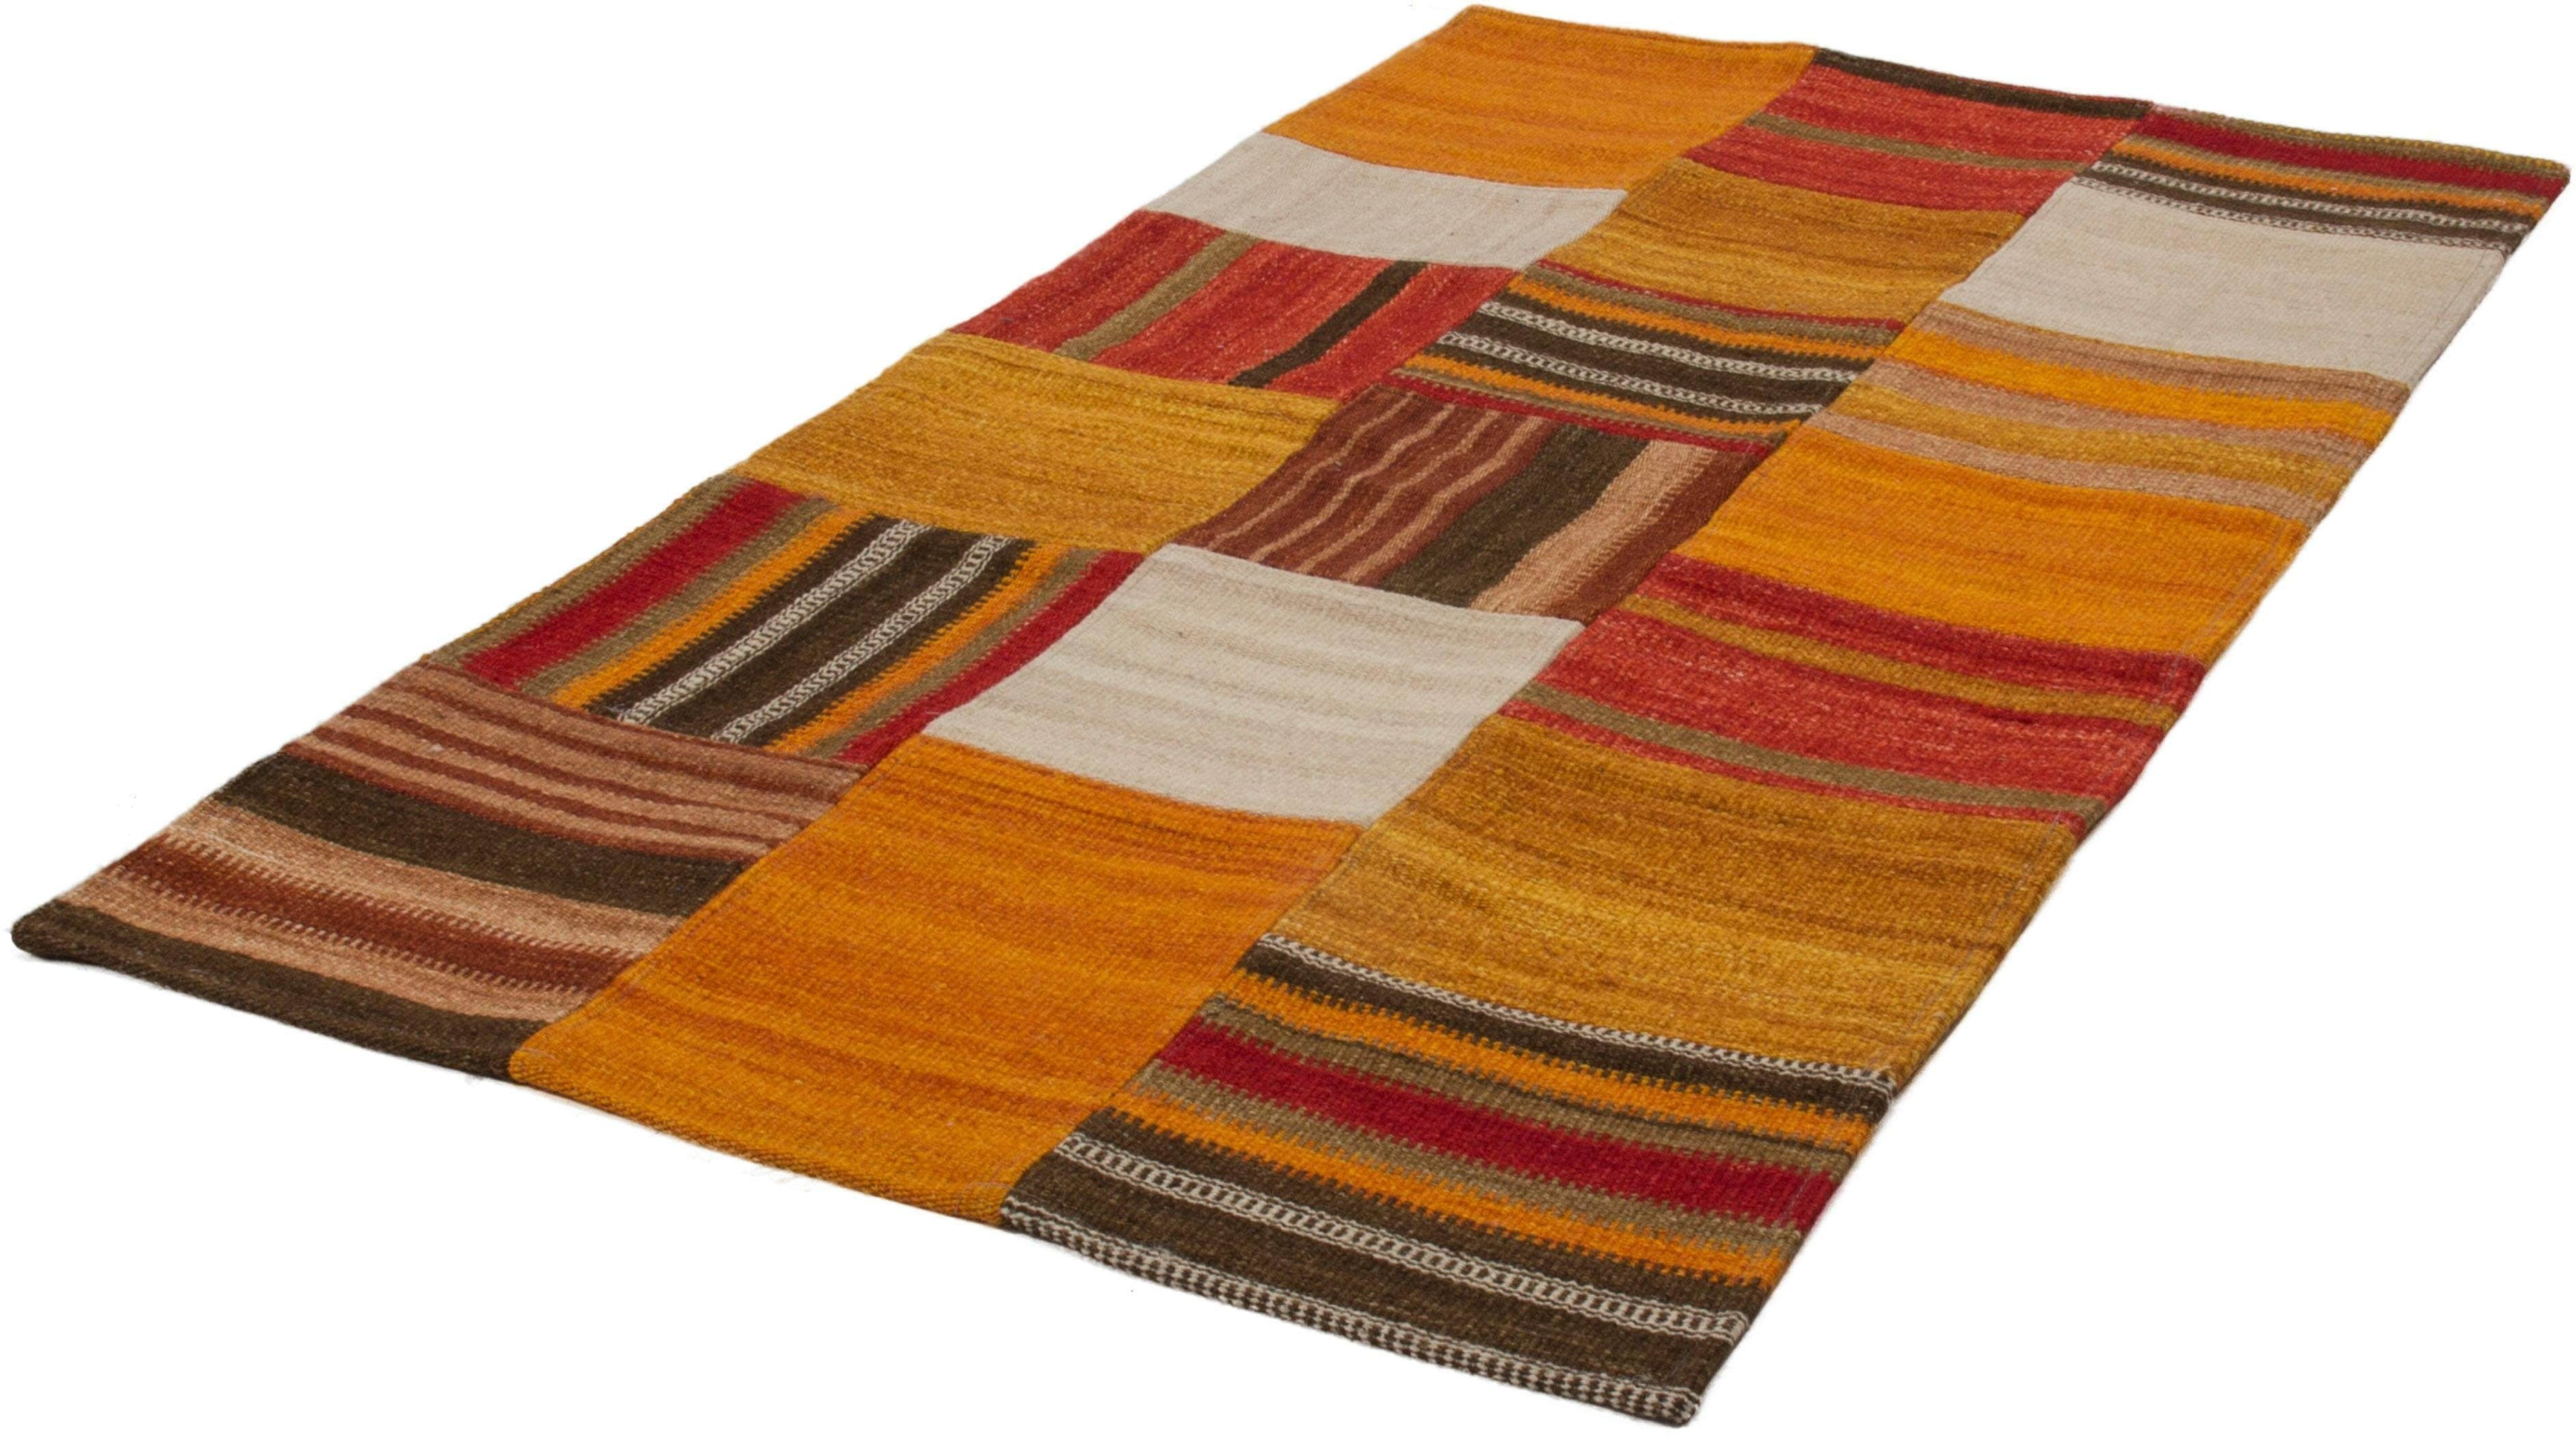 Teppich Shemar 150 calo-deluxe rechteckig Höhe 12 mm handgewebt